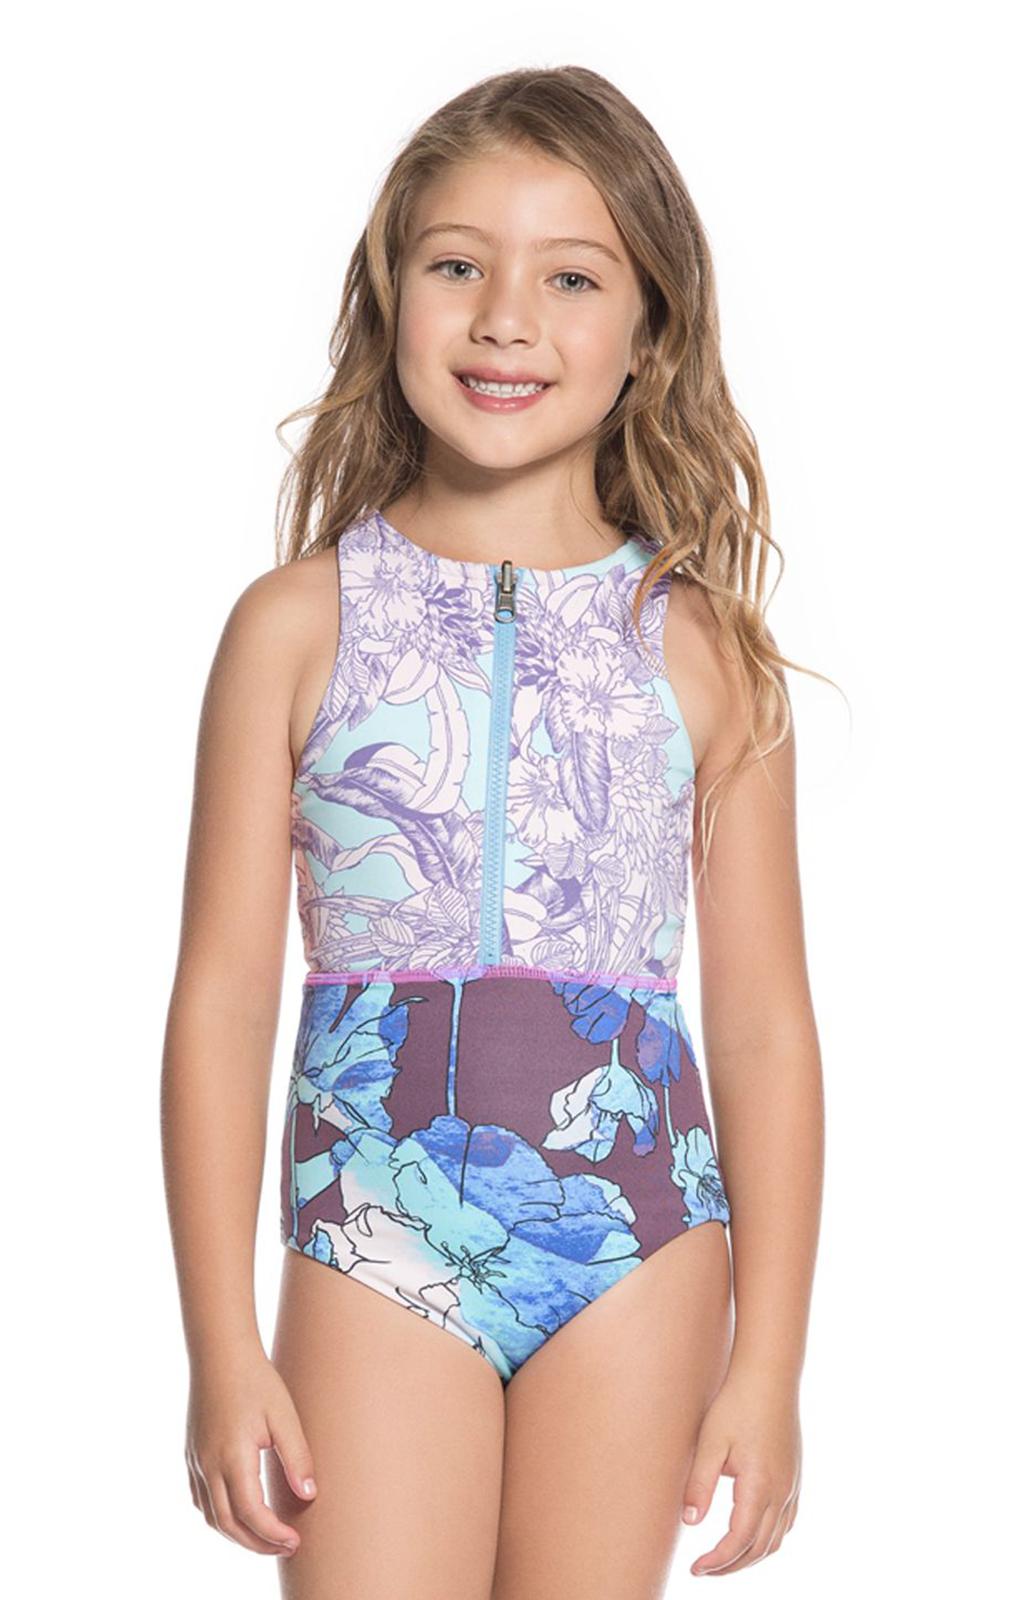 9d090007d6cb6 Little Girls Zipped Purple Print One-piece Swimsuit - Santa Catalinita -  Maaji